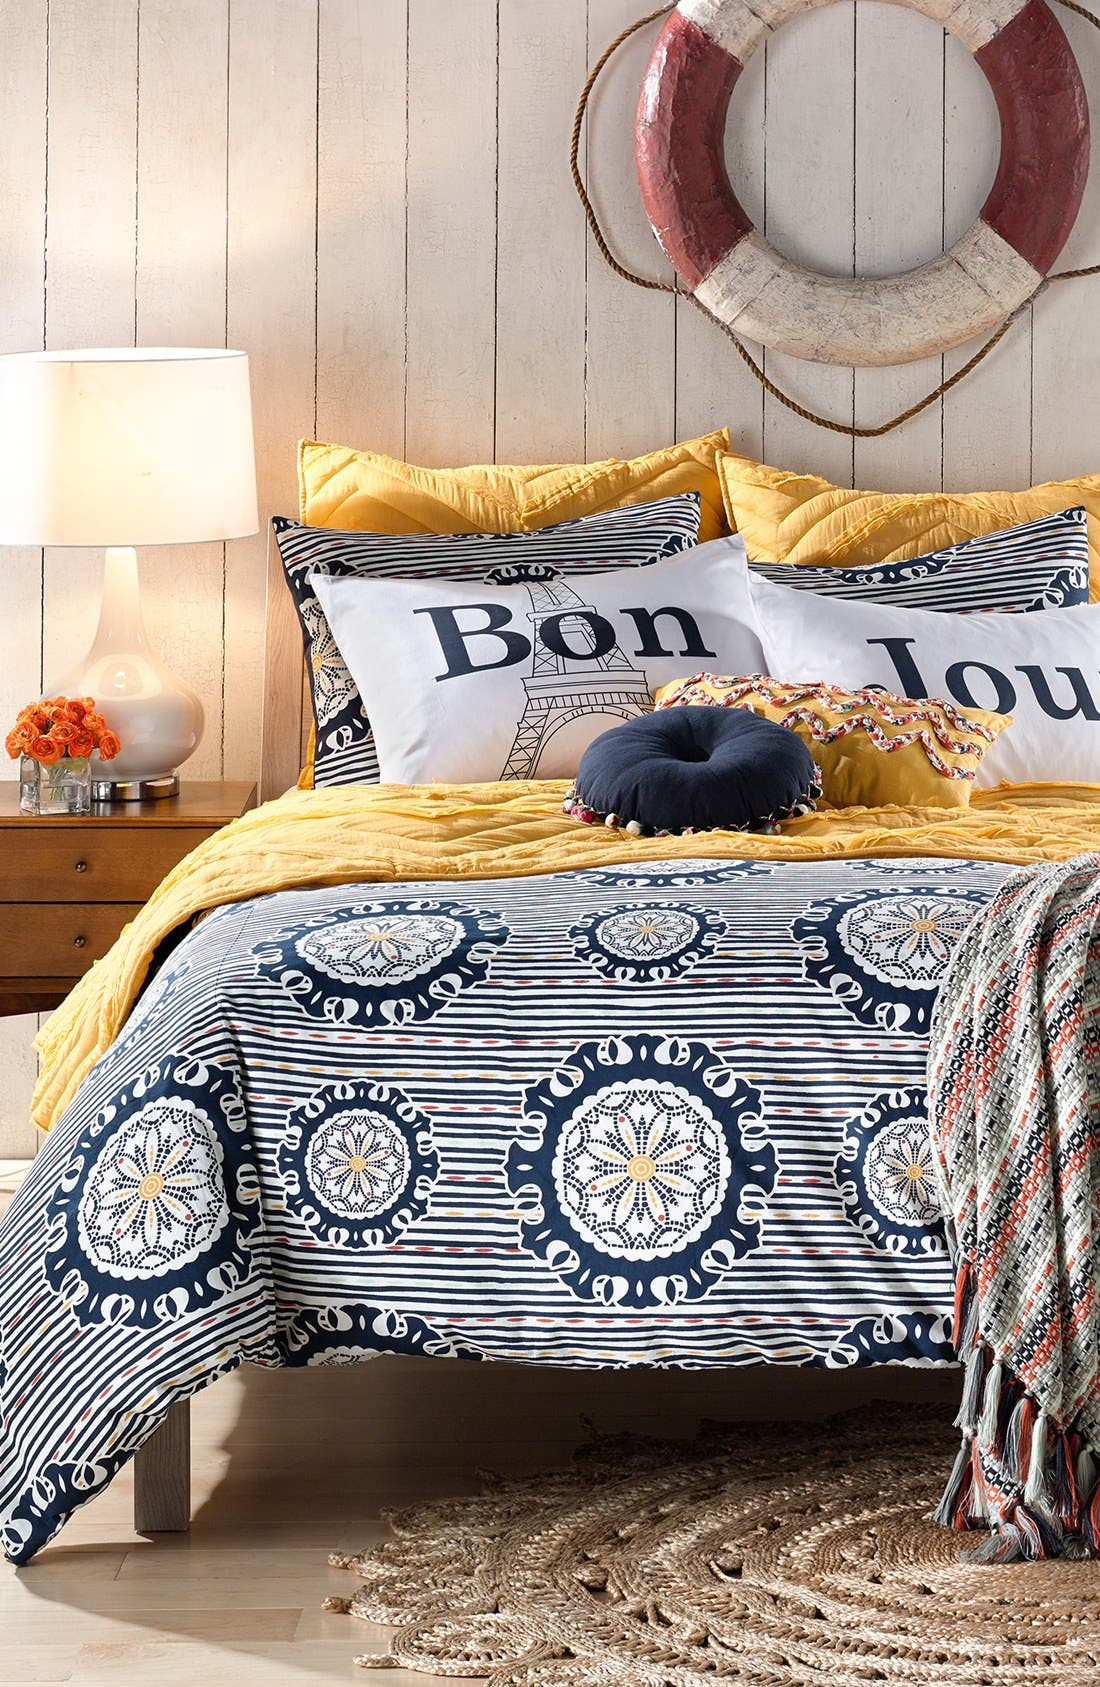 Alternate Image 2  - Levtex 'Bon/Jour' Pillowcase Set